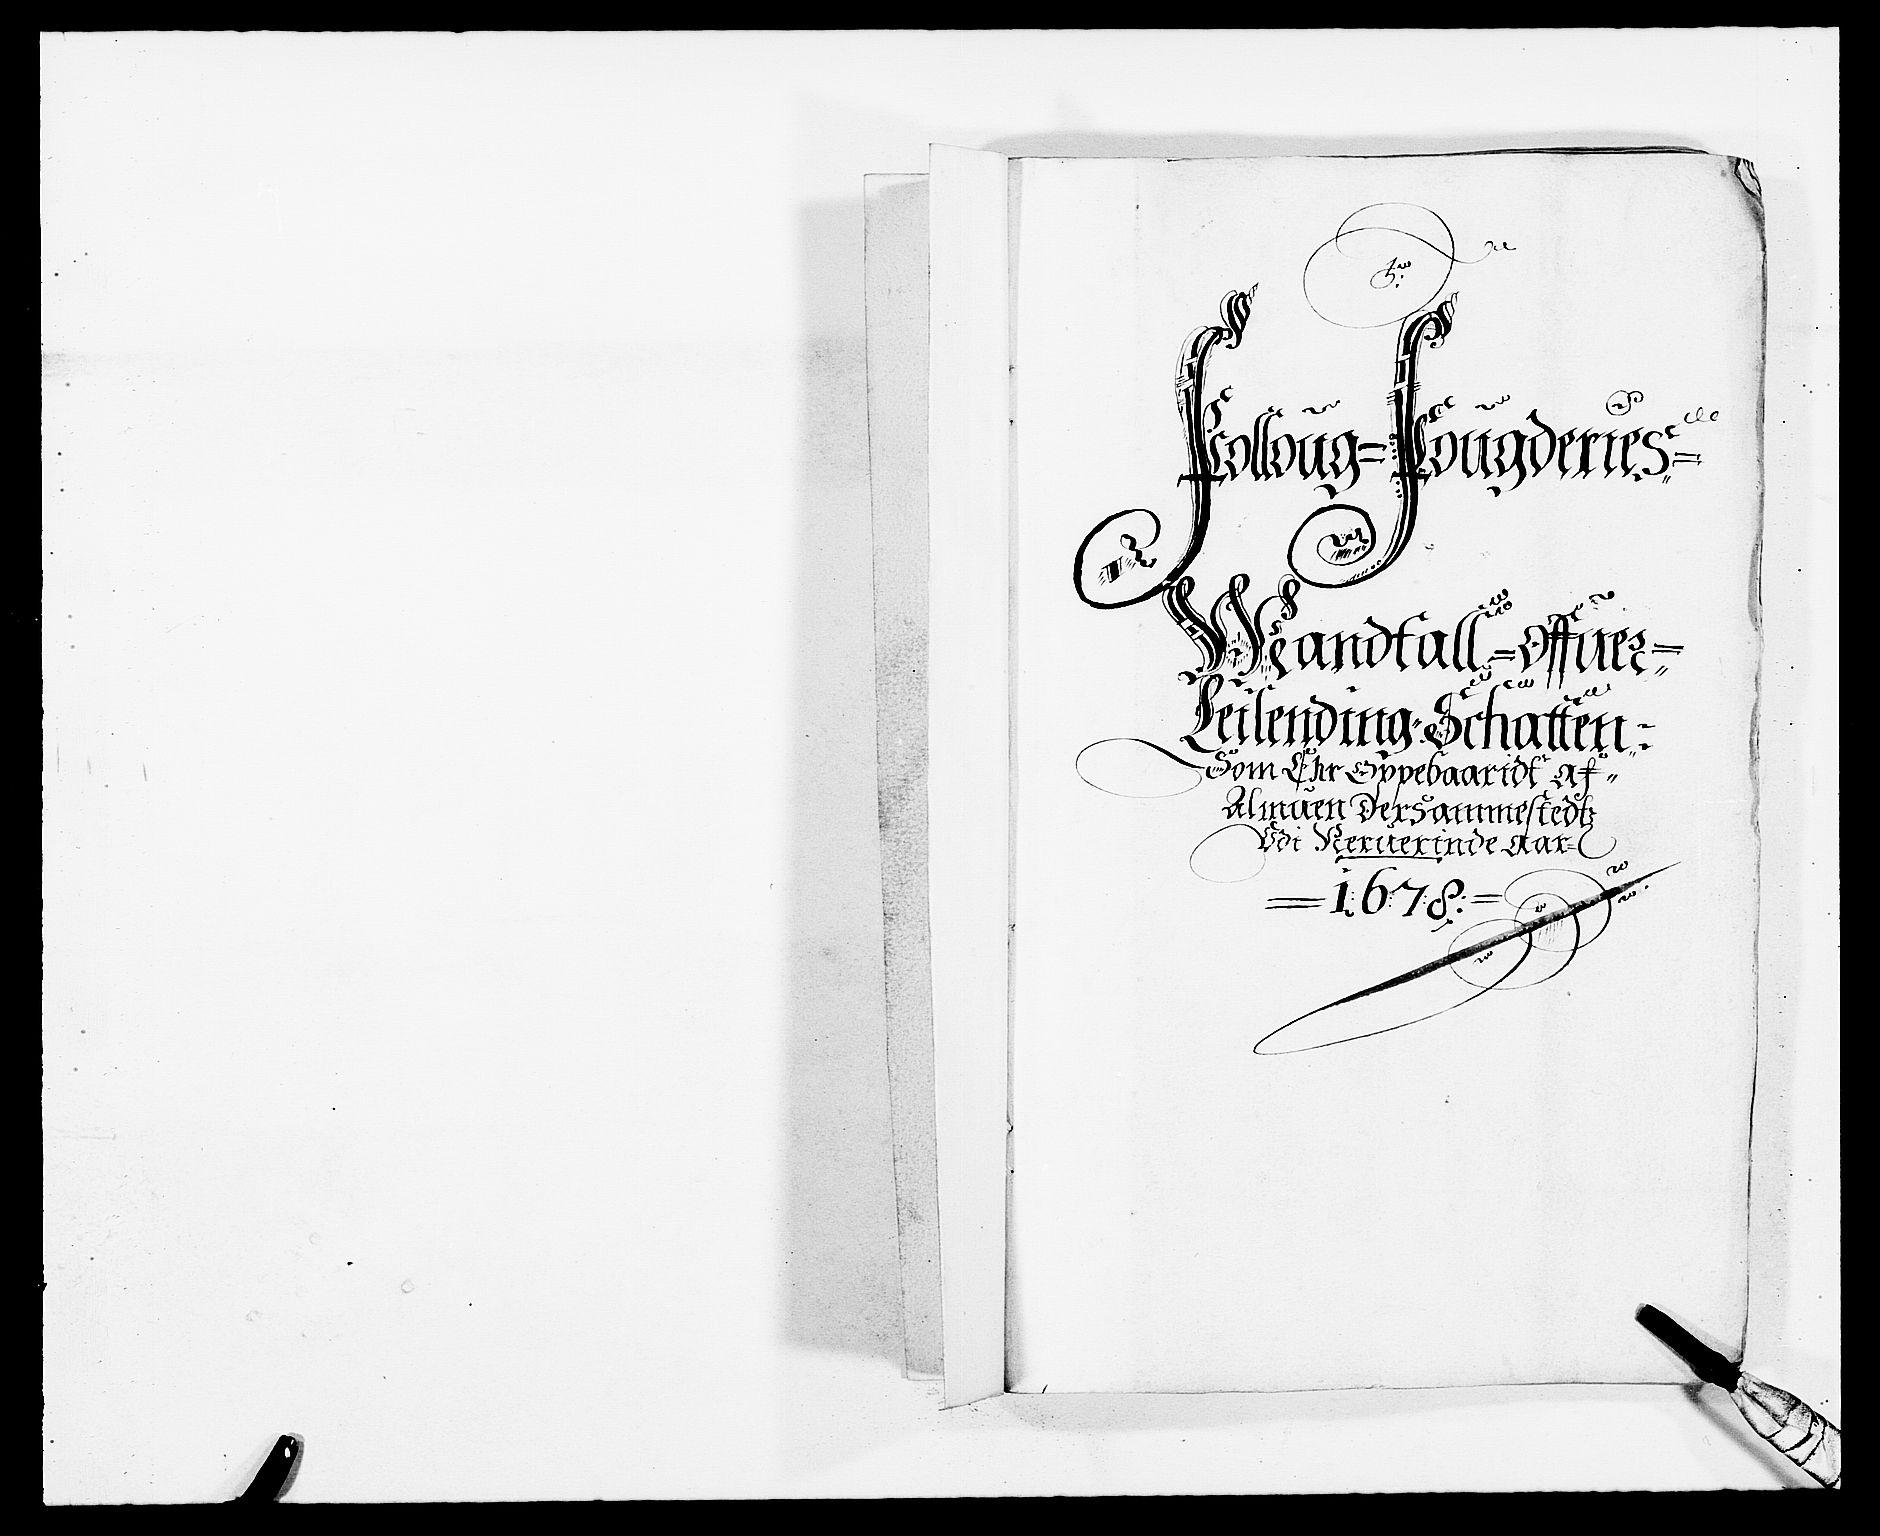 RA, Rentekammeret inntil 1814, Reviderte regnskaper, Fogderegnskap, R09/L0427: Fogderegnskap Follo, 1678, s. 36